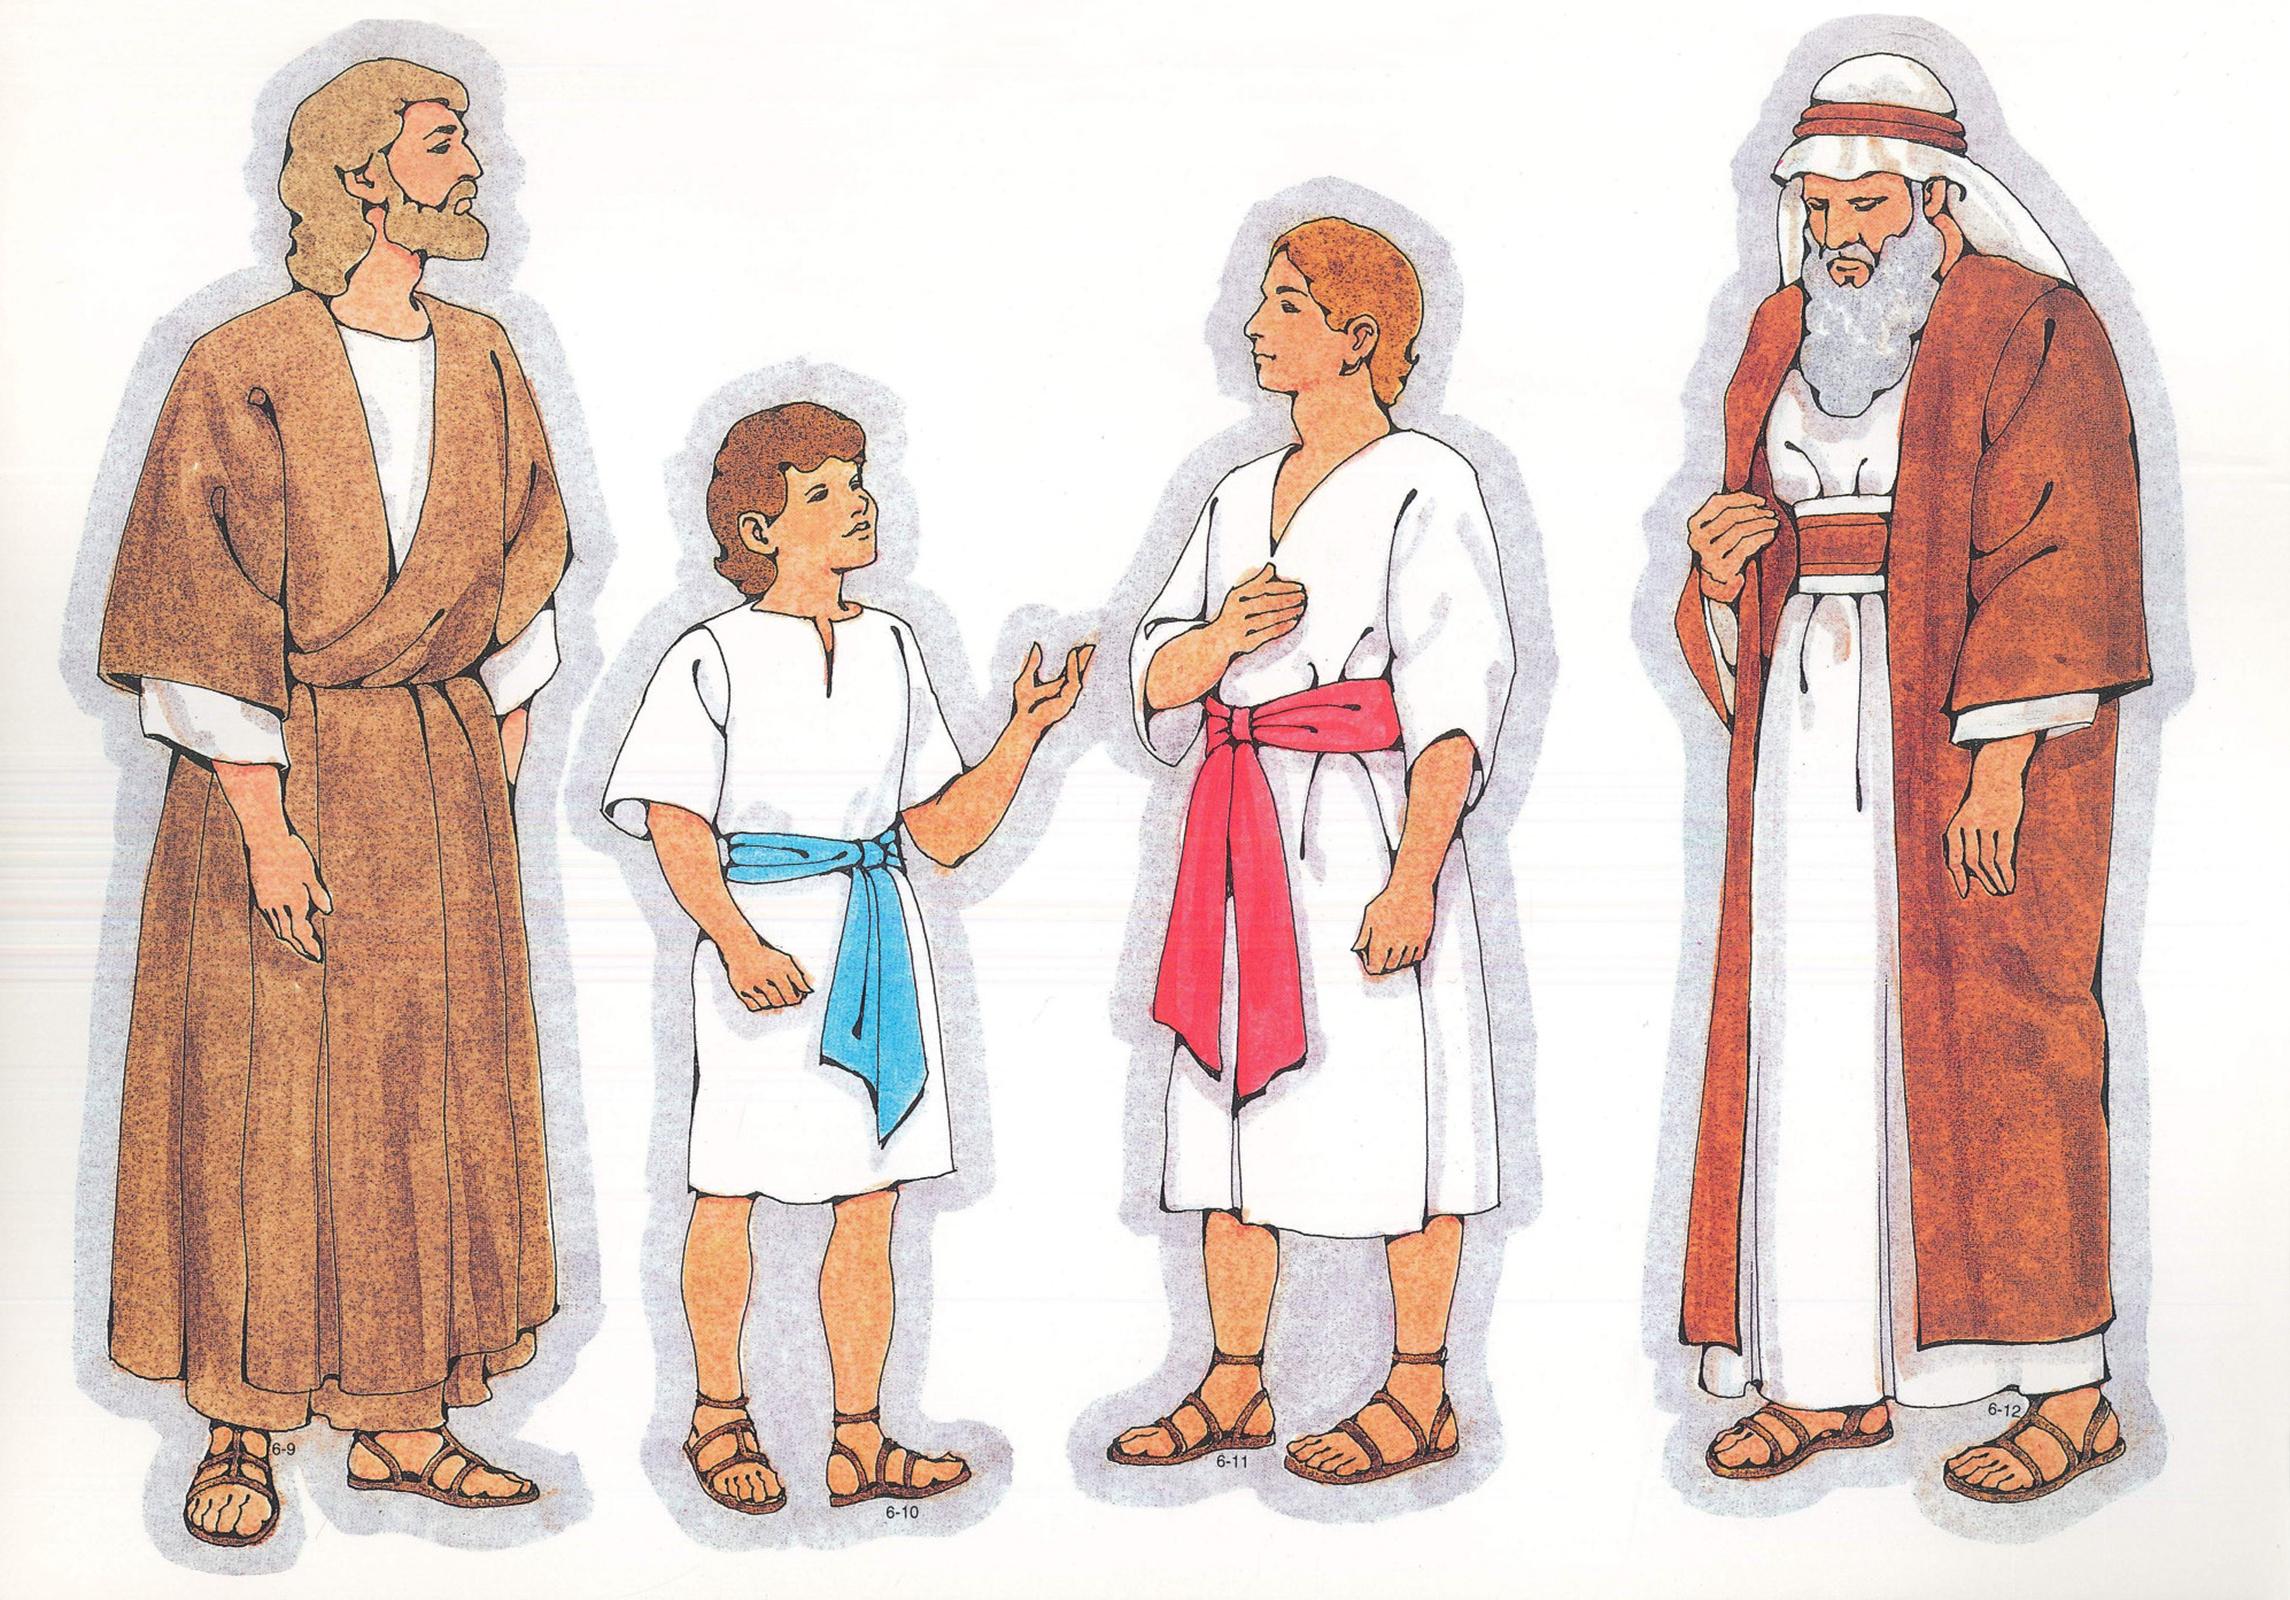 primary visual aids cutouts 6 9 biblical man 6 10 biblical boy